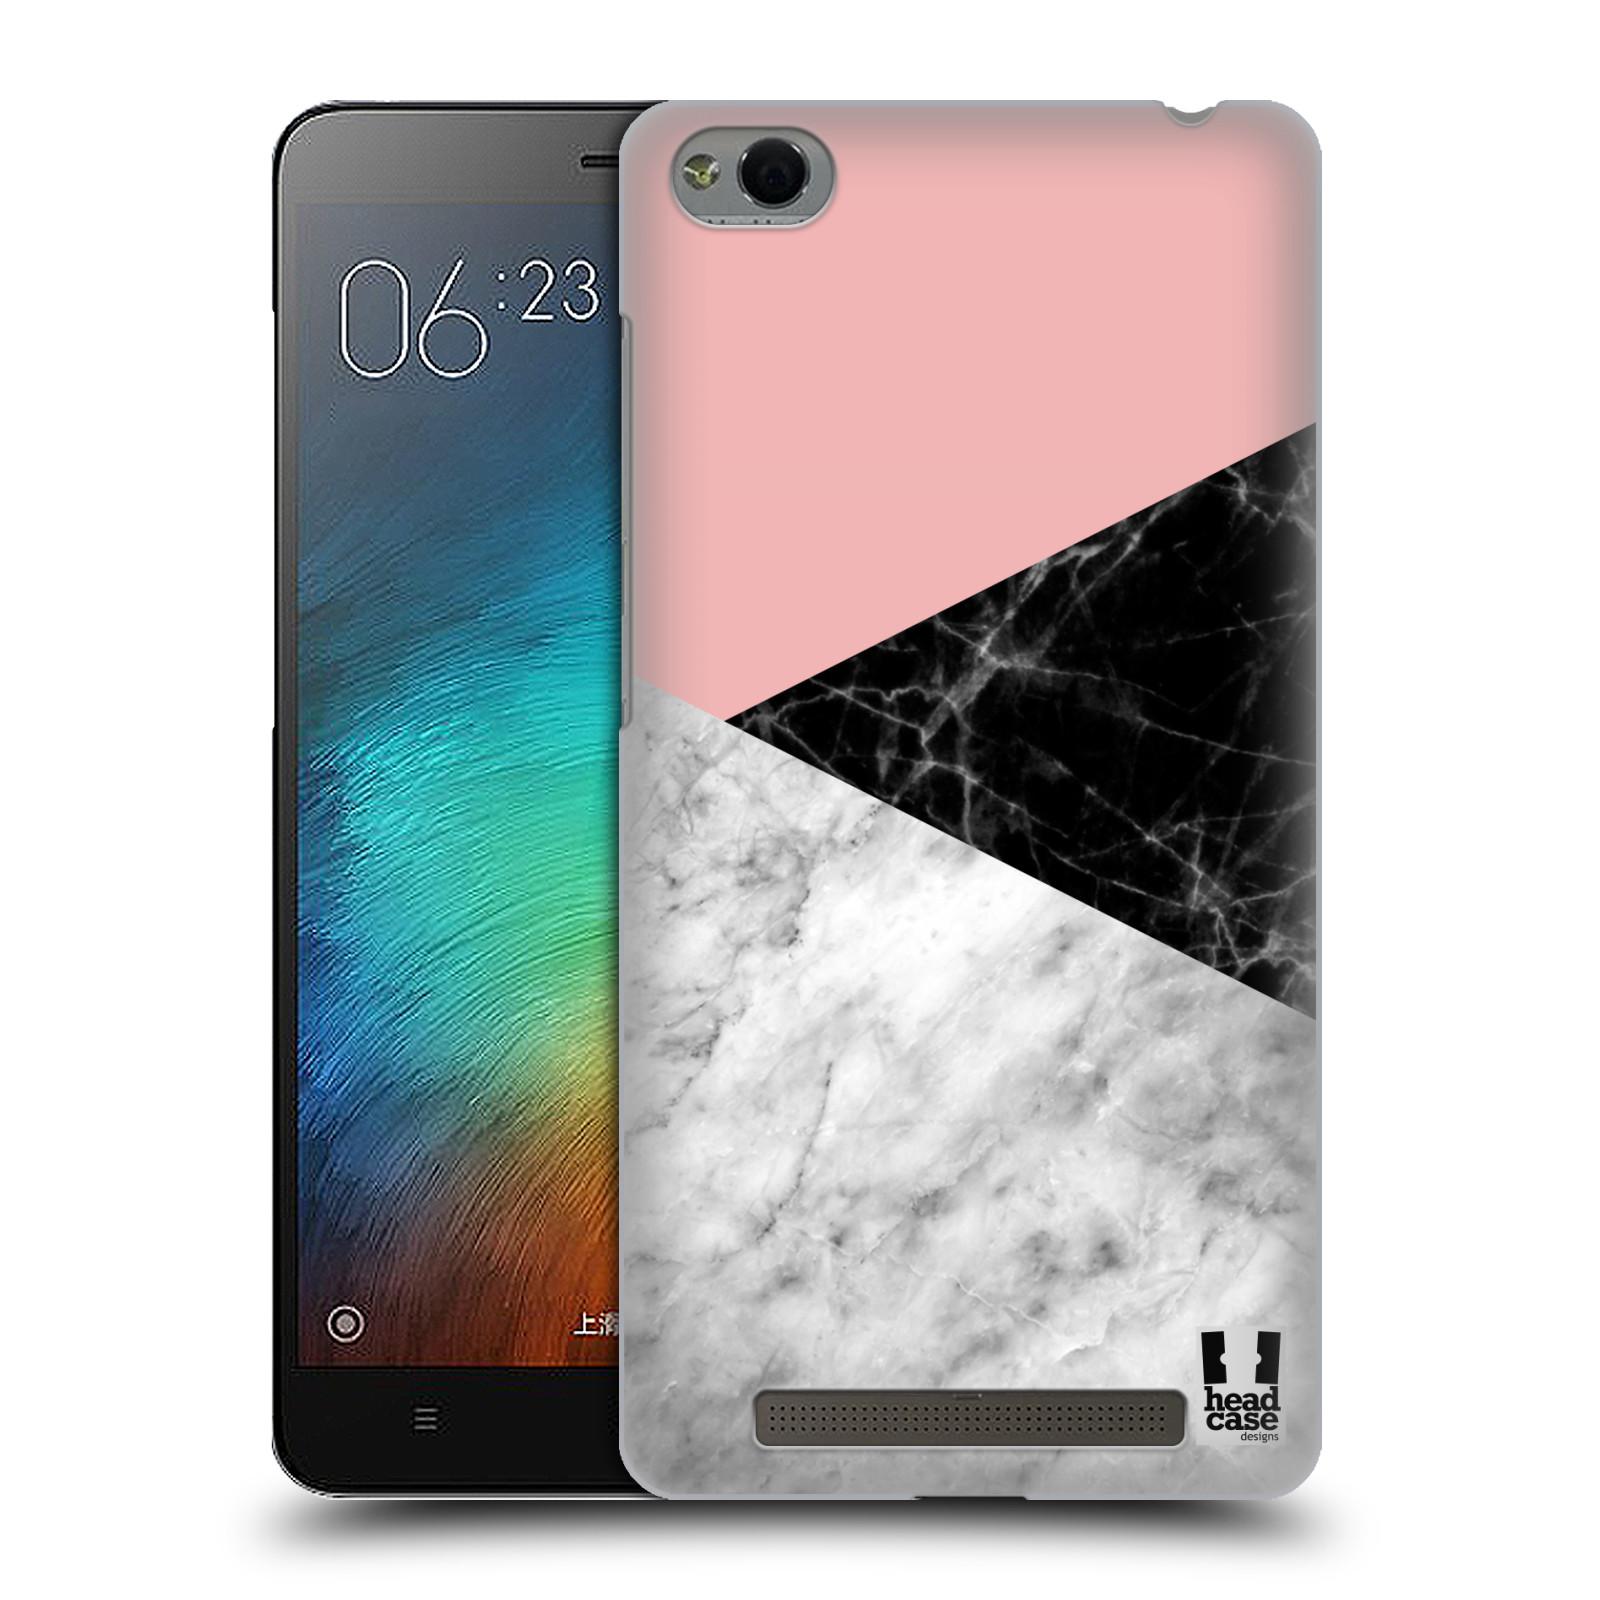 Plastové pouzdro na mobil Xiaomi Redmi 3 - Head Case - Mramor mix